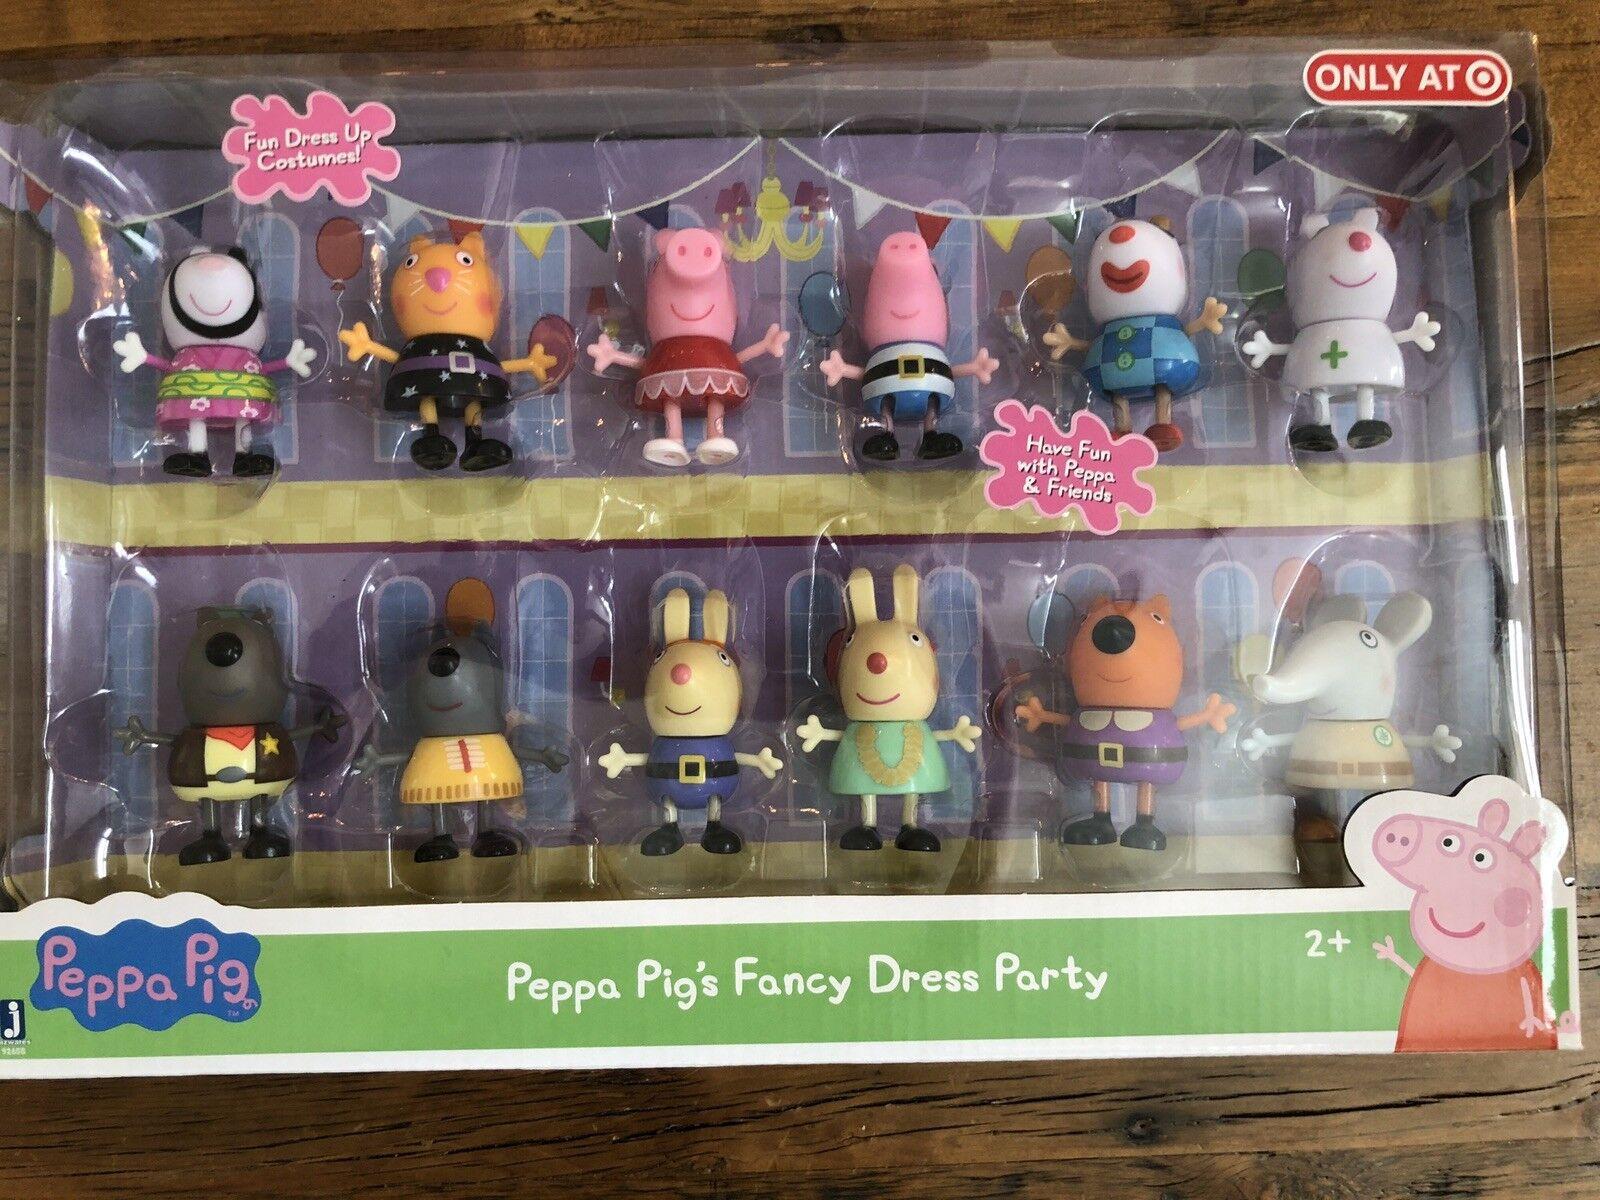 NEW Peppa Pig's Fancy Dress Party 12 Piece Figure Set Peppa & Friends Dress Up